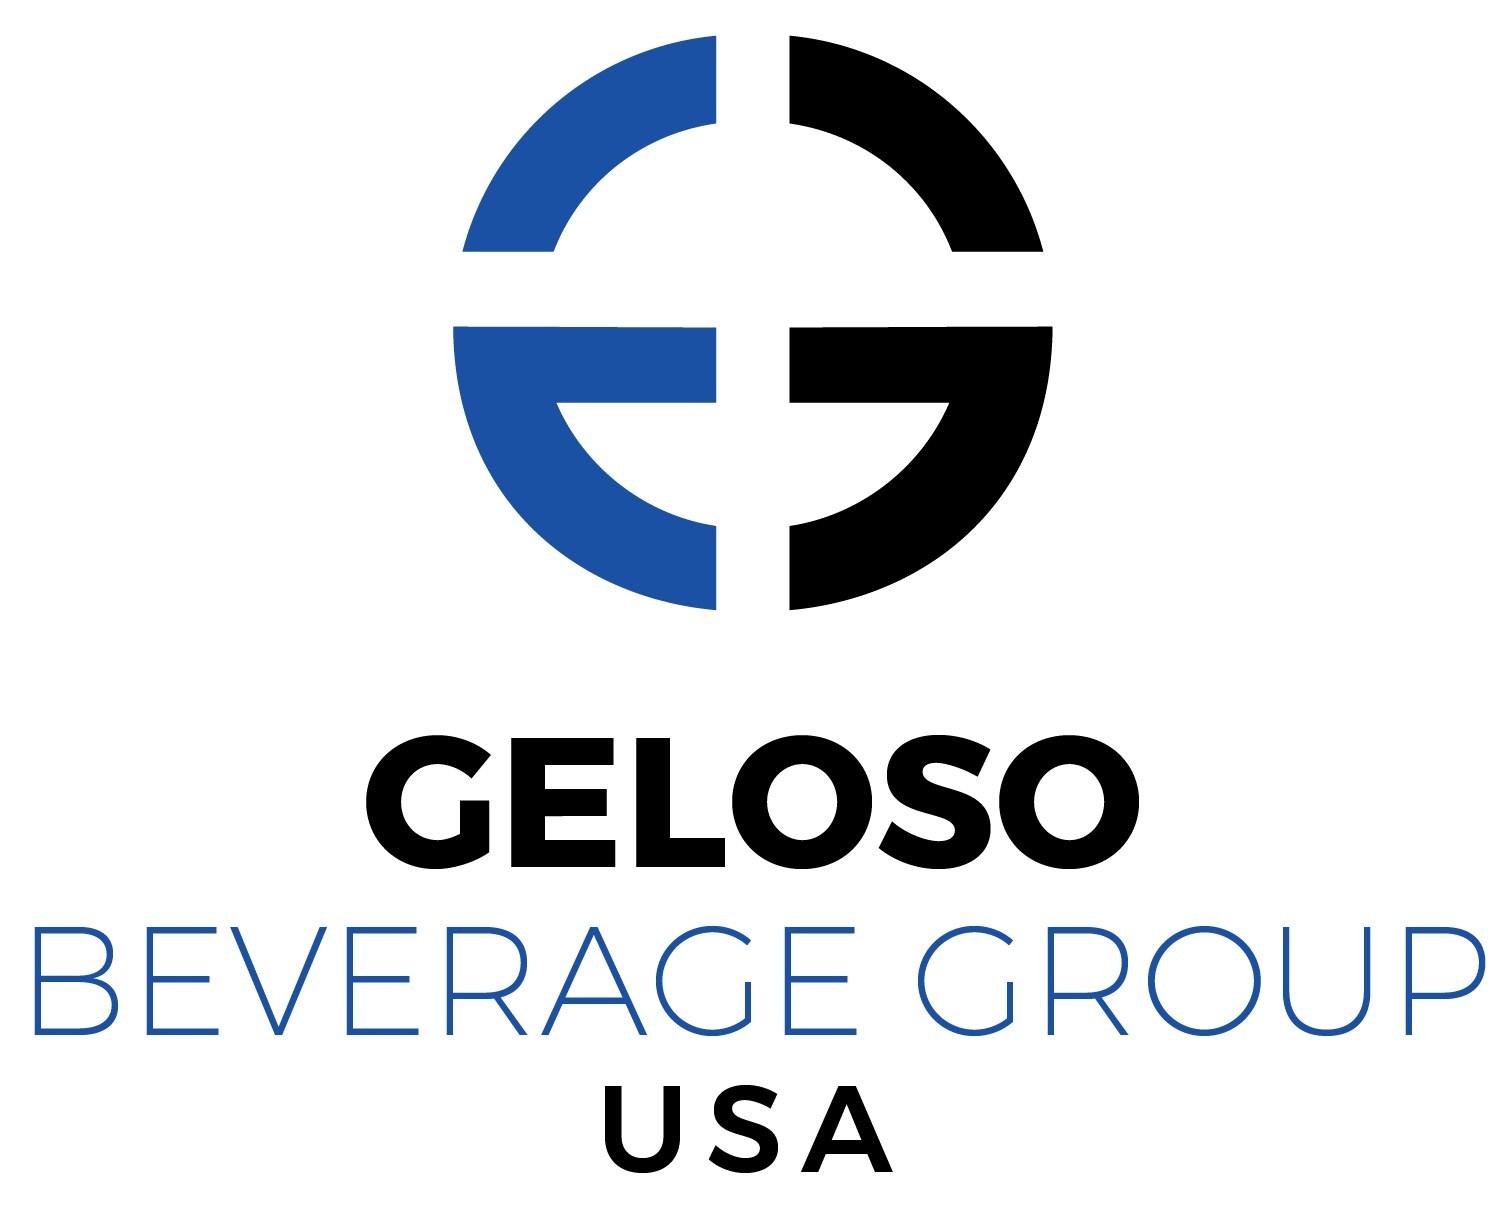 Geloso Beverage Group Announces 2018 Impact Hot Brand Award, Naming